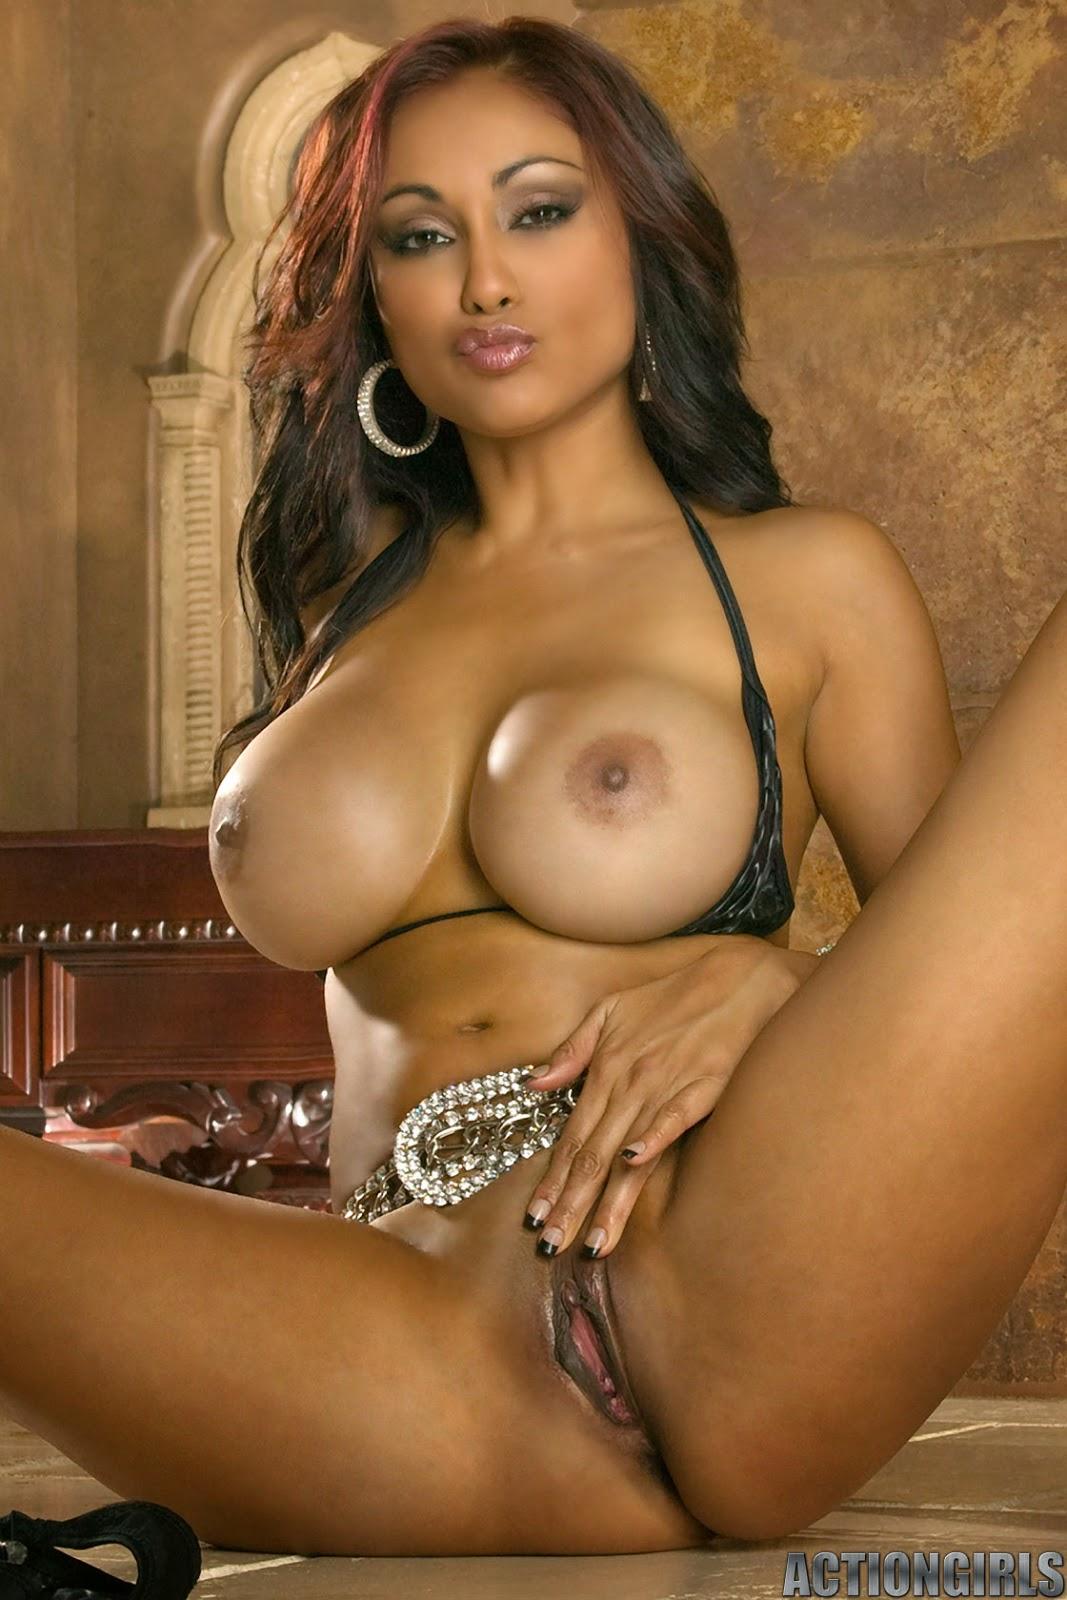 Charmaine Sinclair Blowjob Amazing hot naked chicks!: priya rai nude